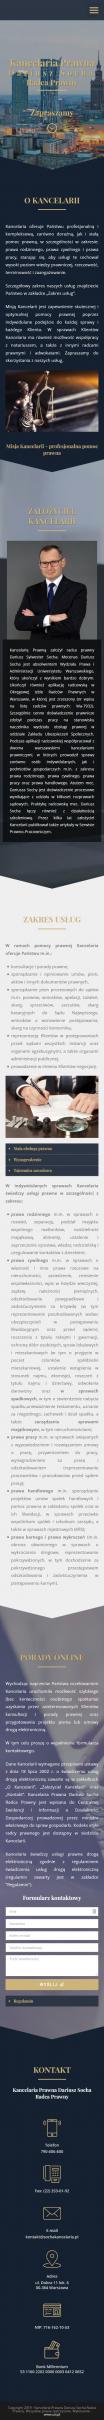 Screenshot 2019 11 04 Kancelaria Prawna Dariusz Socha Adwokat Warszawa